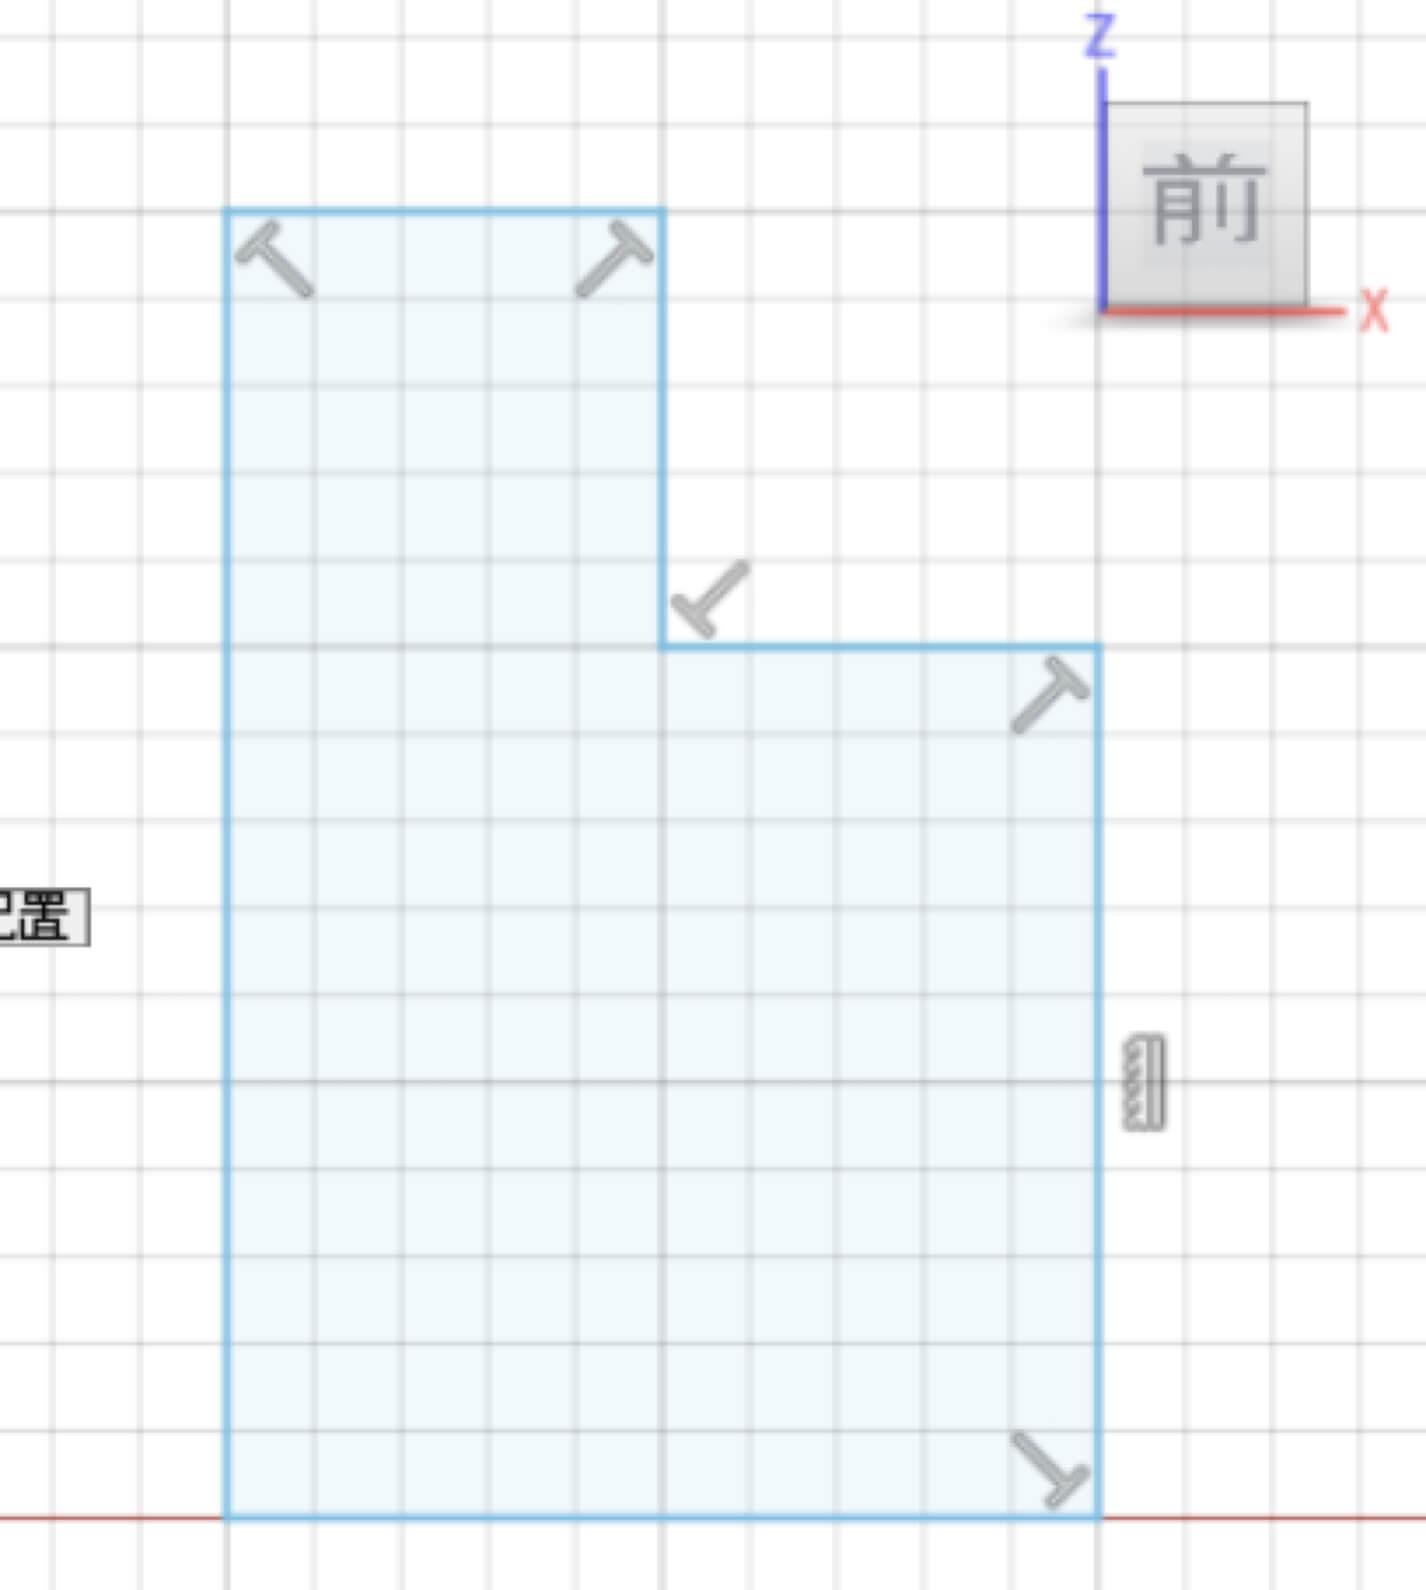 column-20200901-02-ph06.jpg